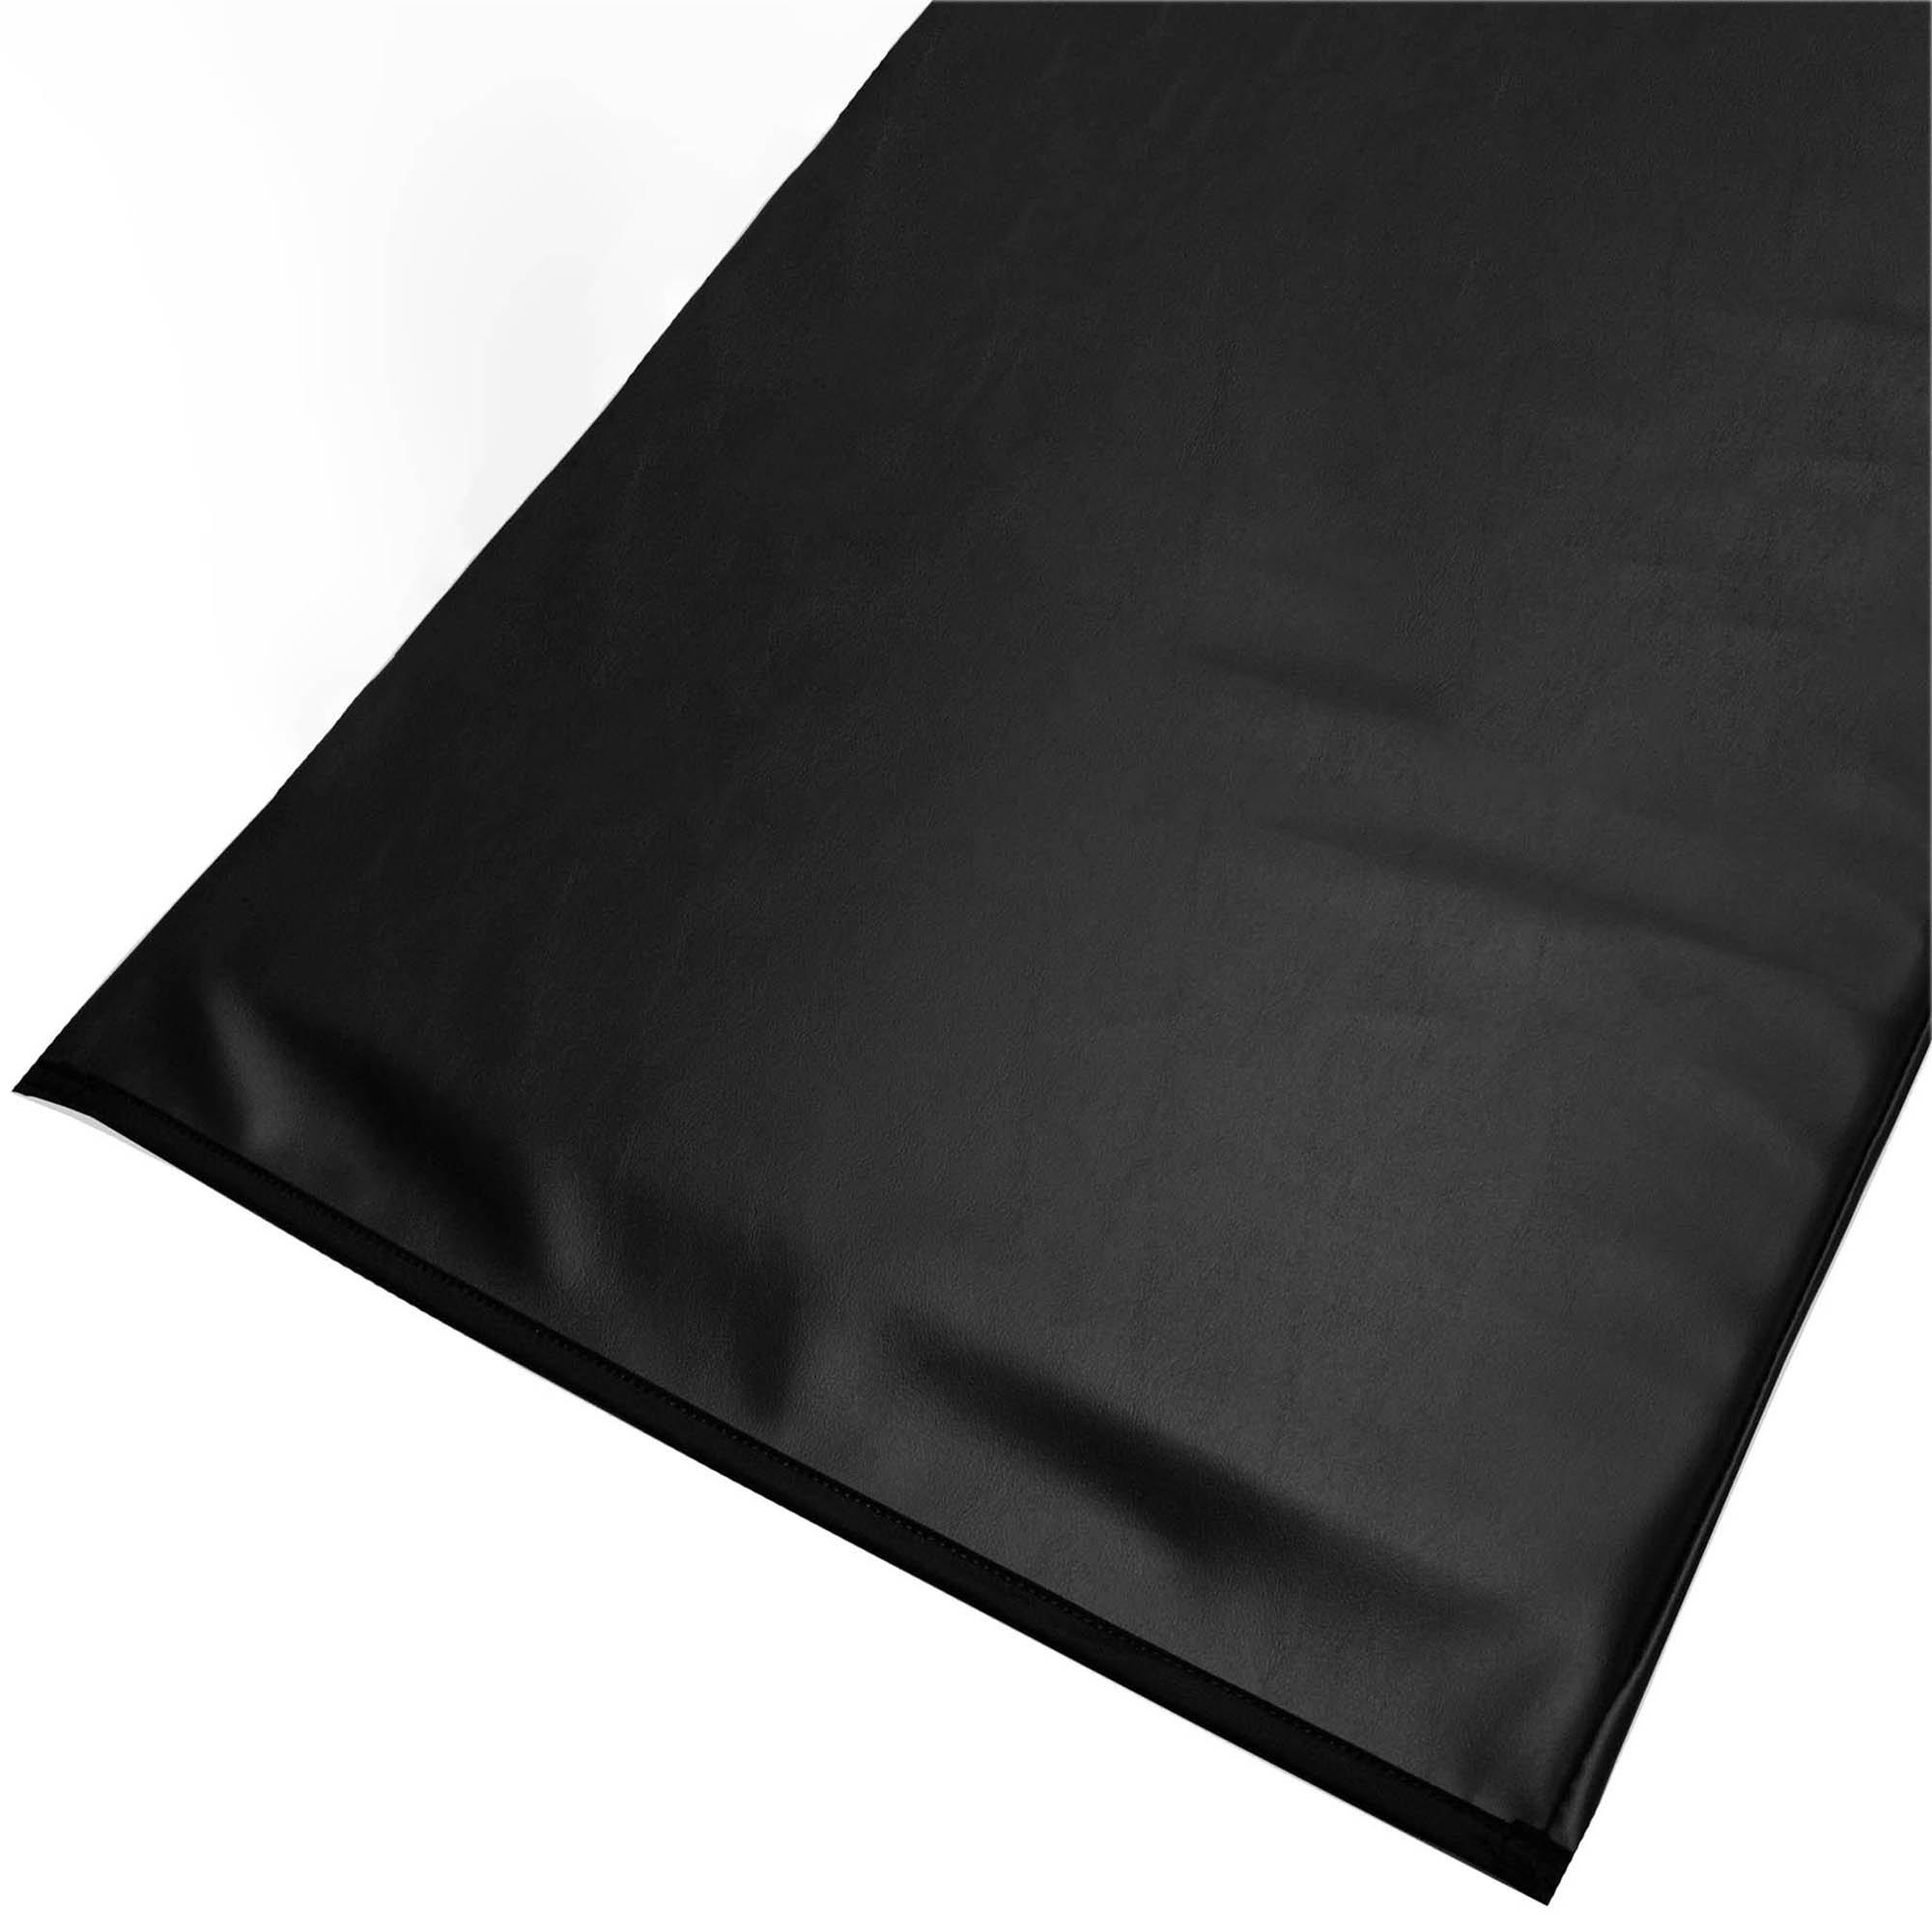 Standard Radiolucent X-Ray Firm Foam Table Pad - Black Vinyl, No Grommets 72